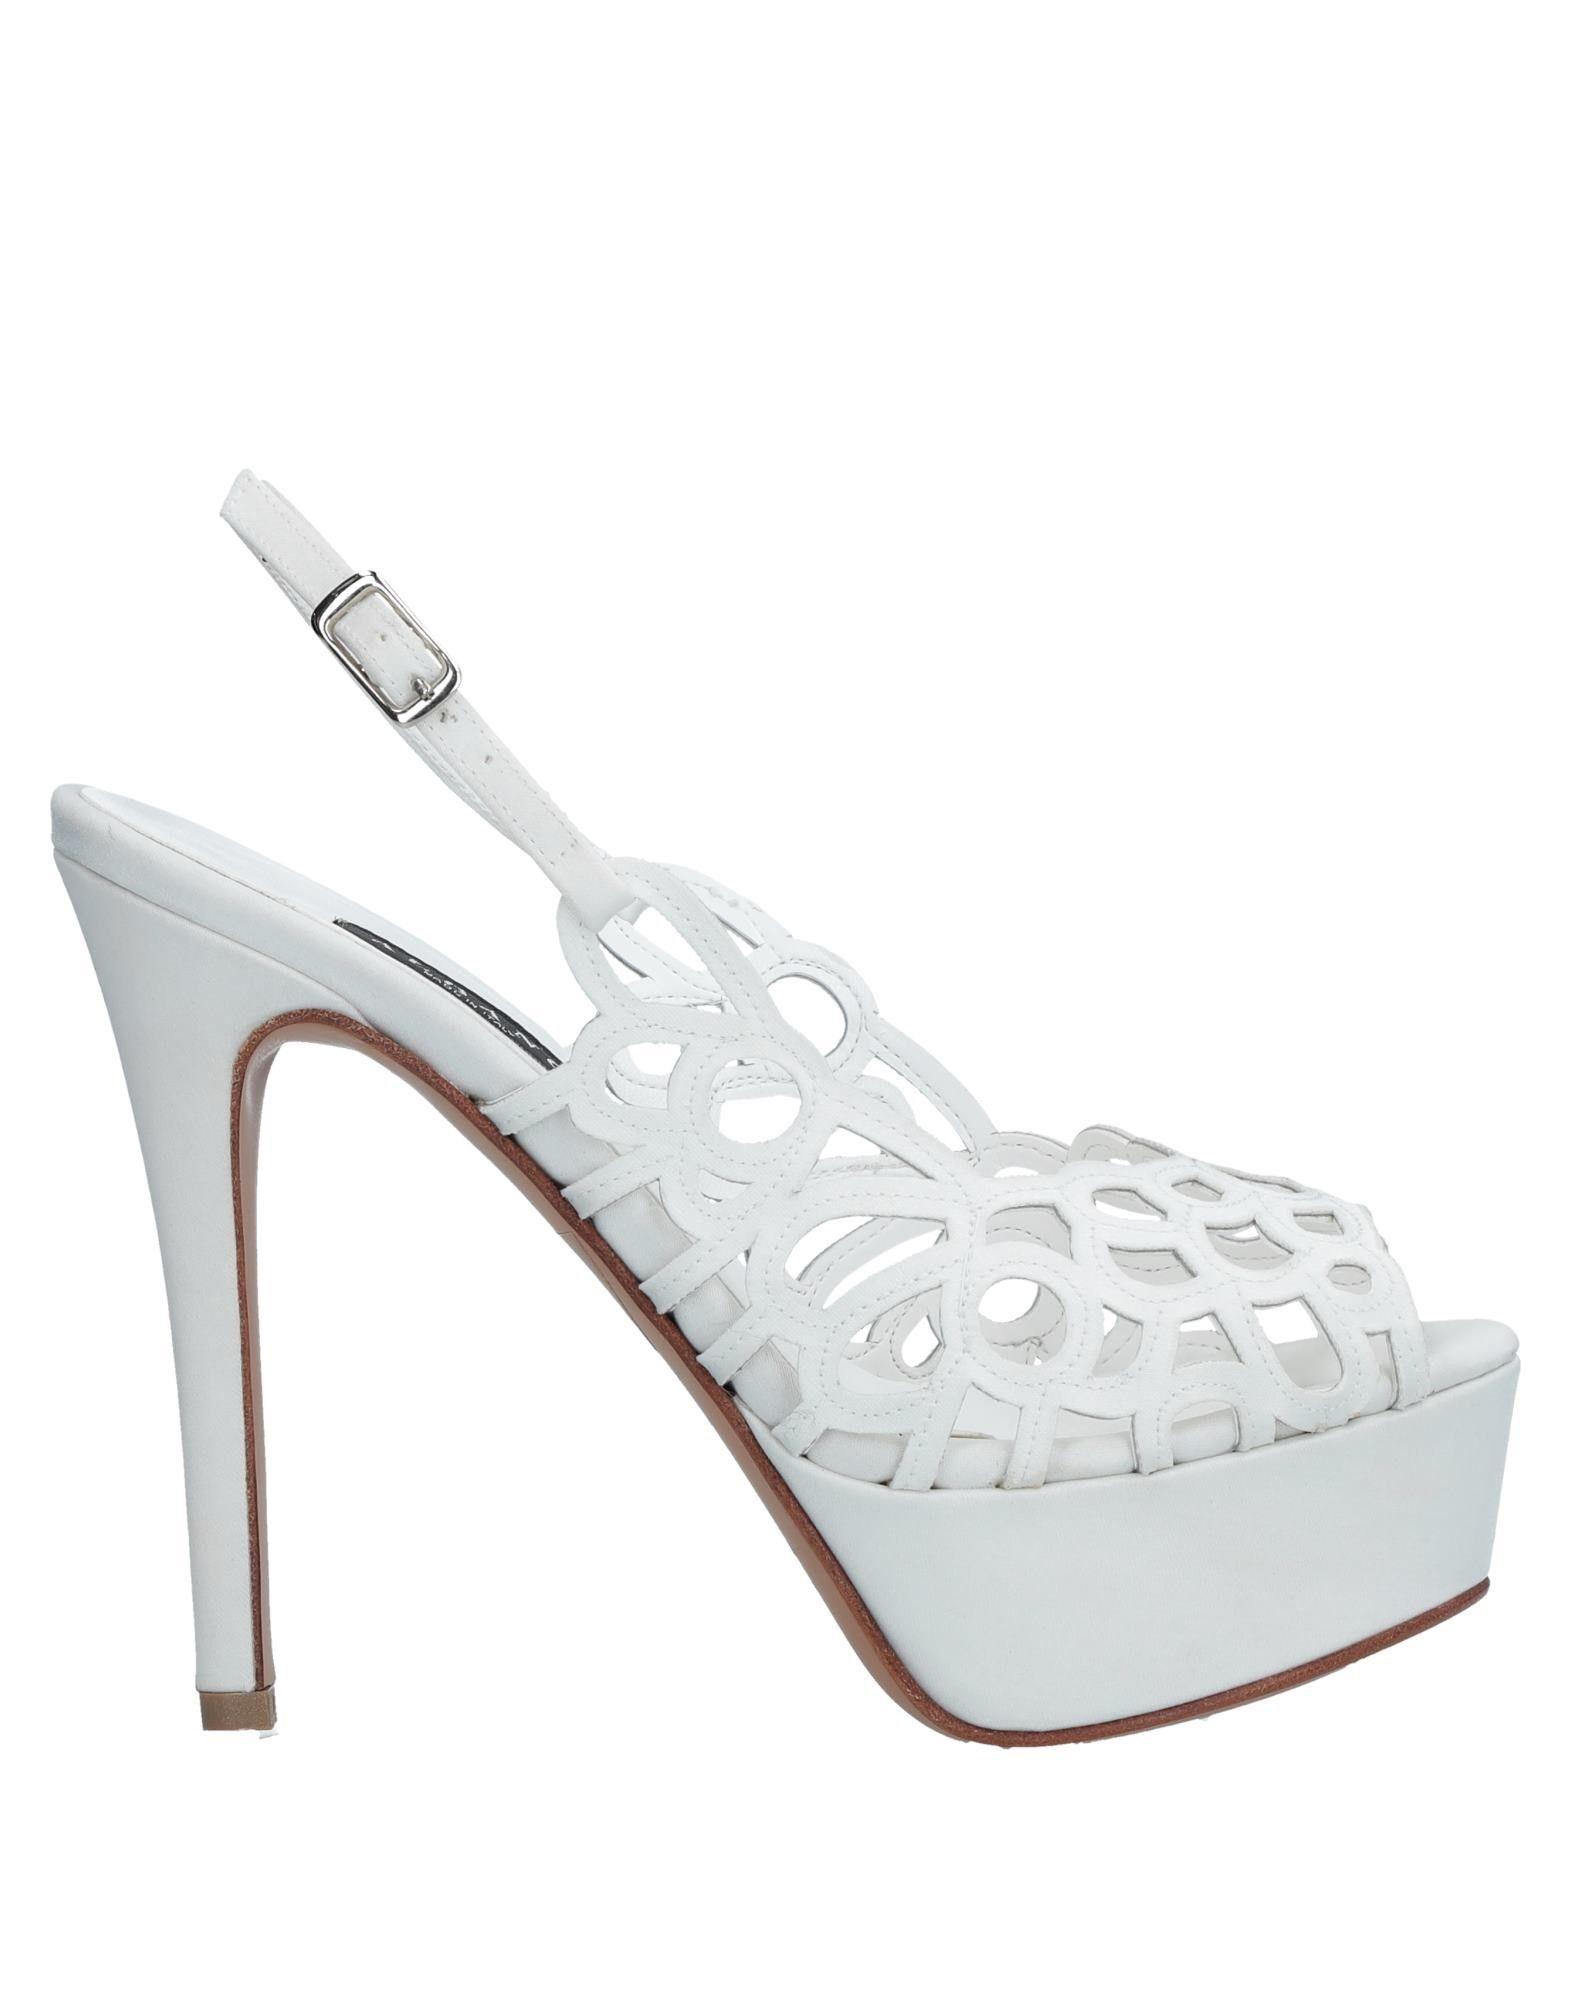 Albano Sandalen Damen  11538122TL Gute Qualität beliebte Schuhe